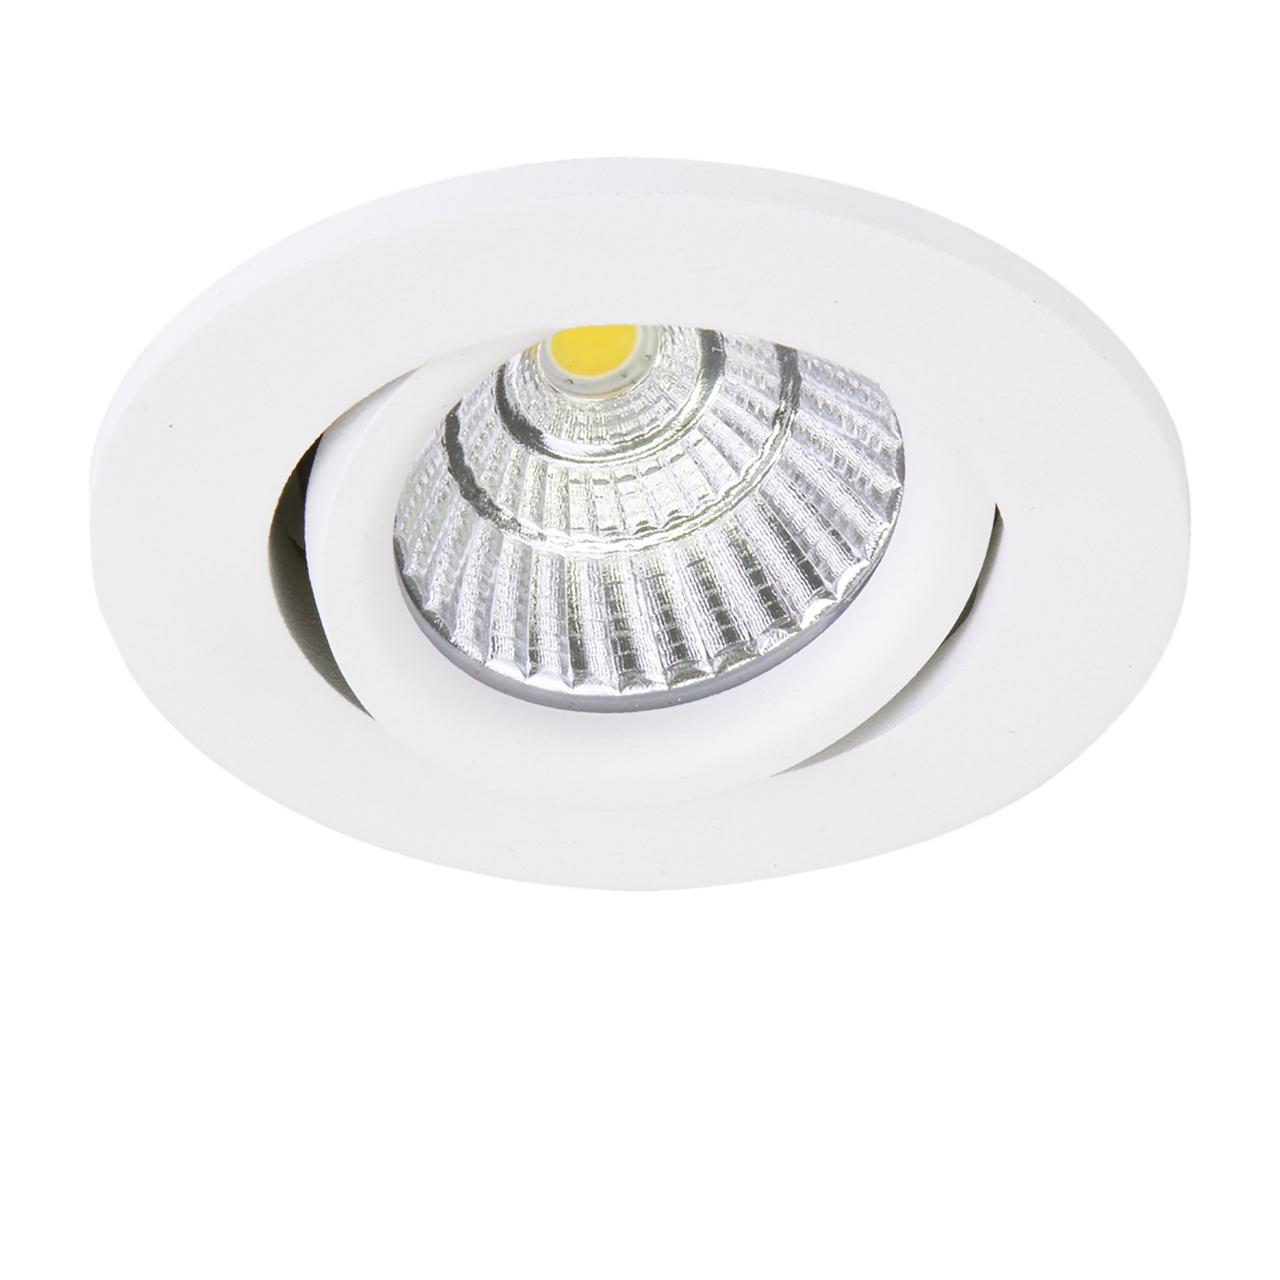 Светильник SOFFI 16 LED 7W 630LM 40G белый 3000K Lightstar 212436